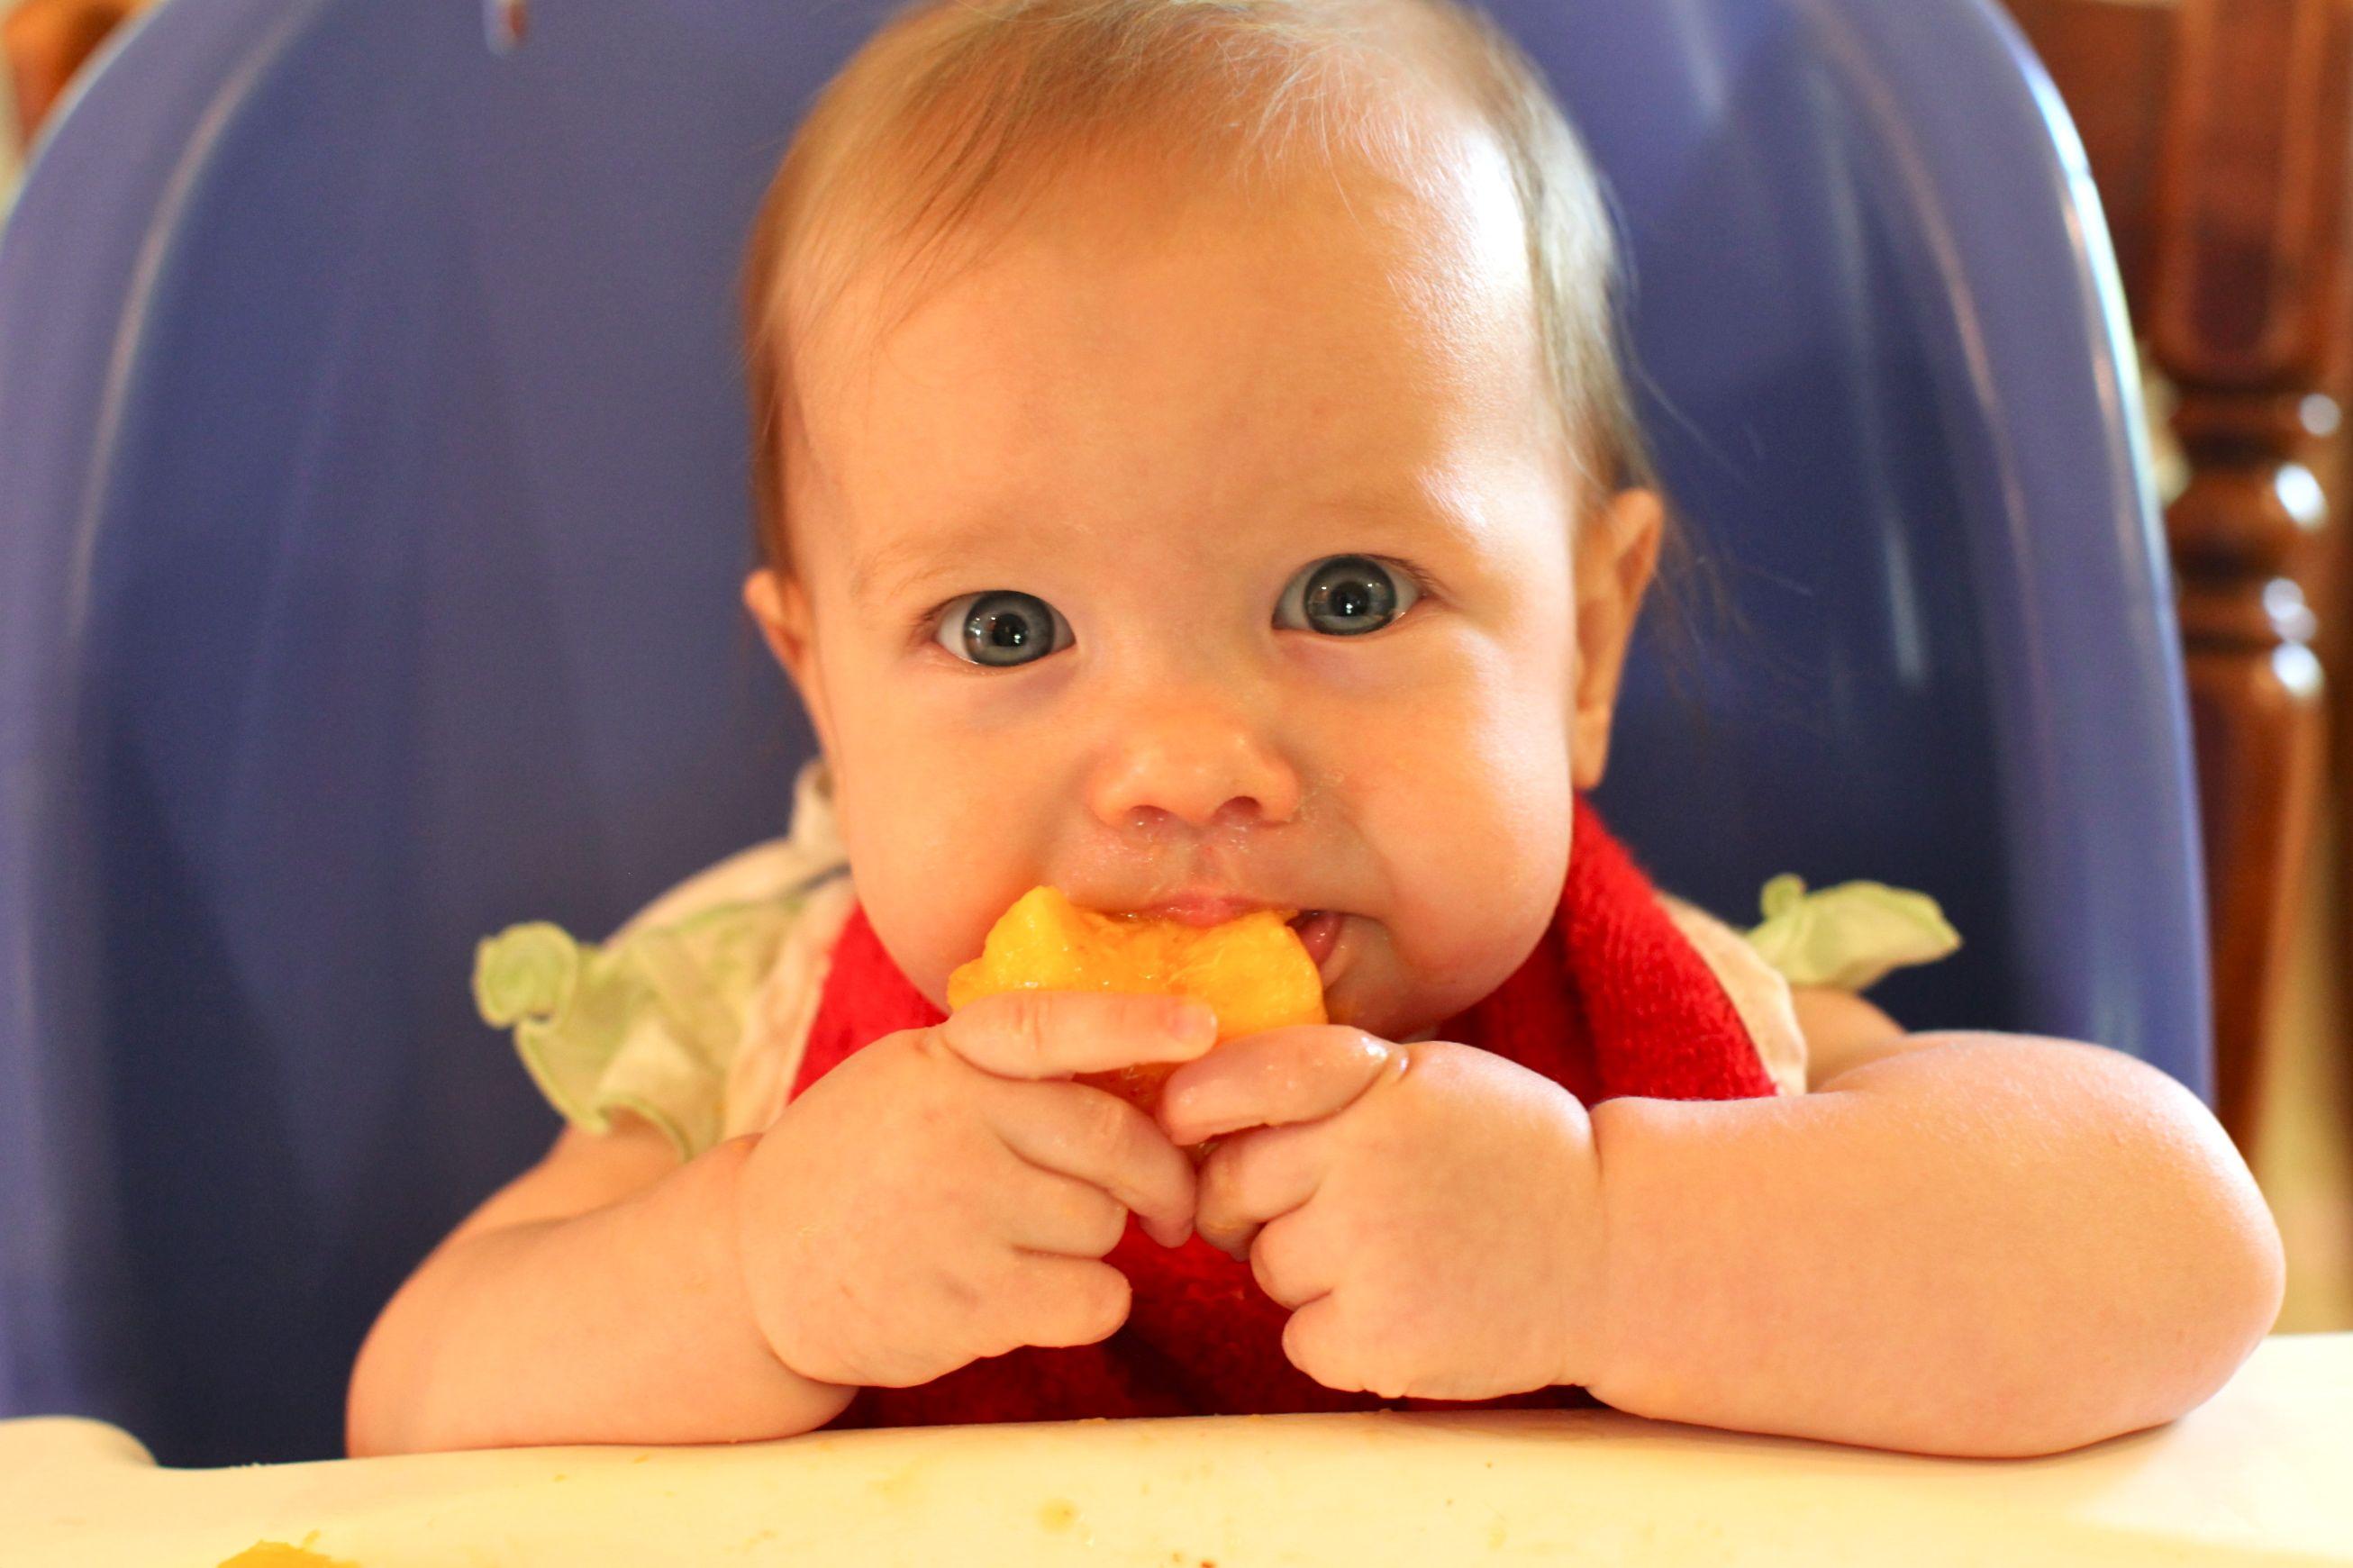 20 Finger Foods To Put Baby On | BabyGaga